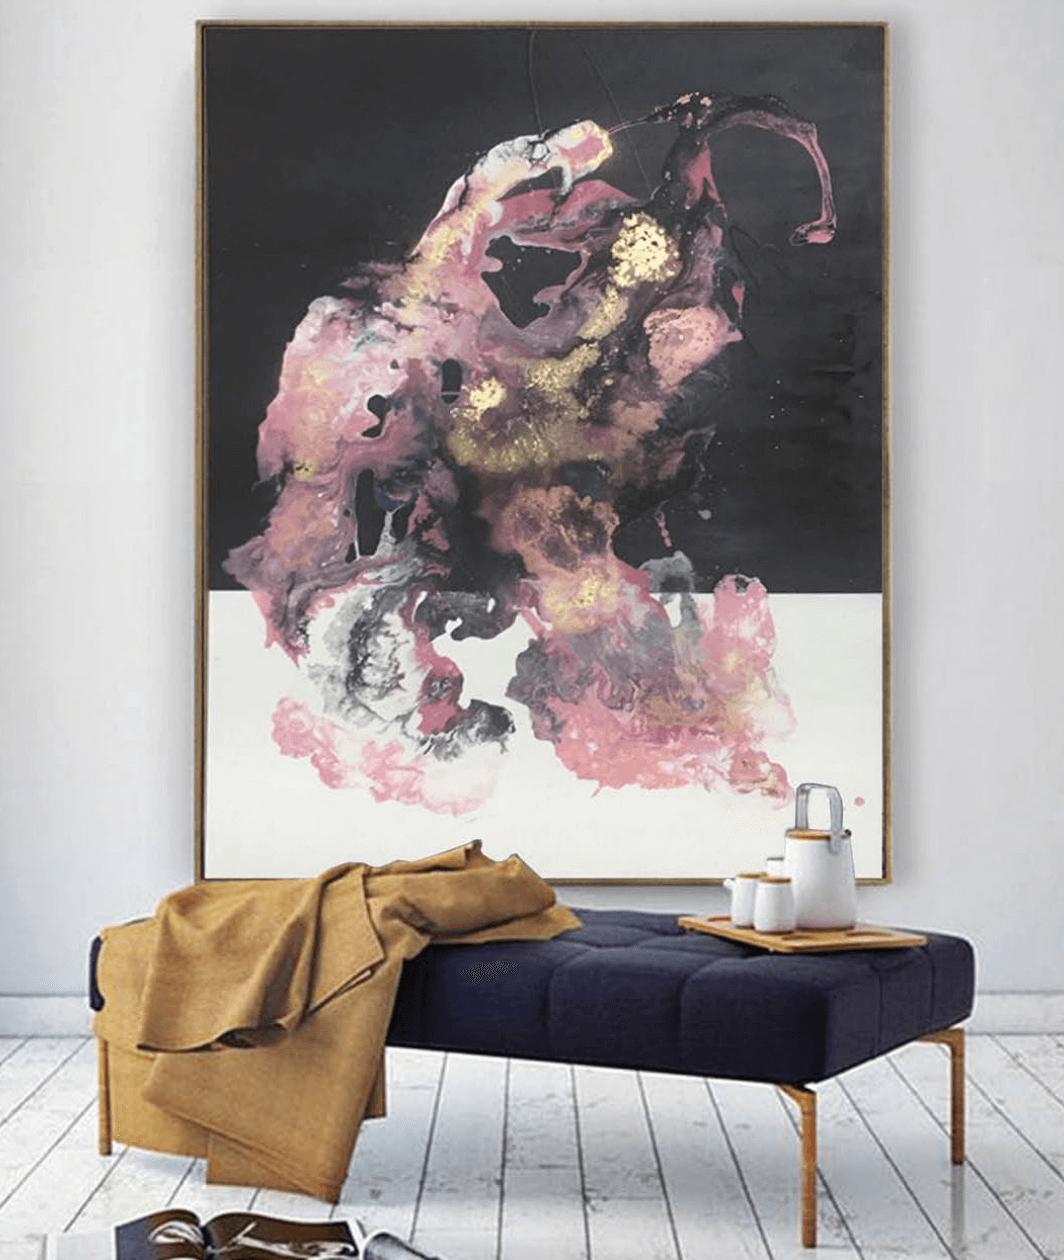 JIE ART & DESIGN